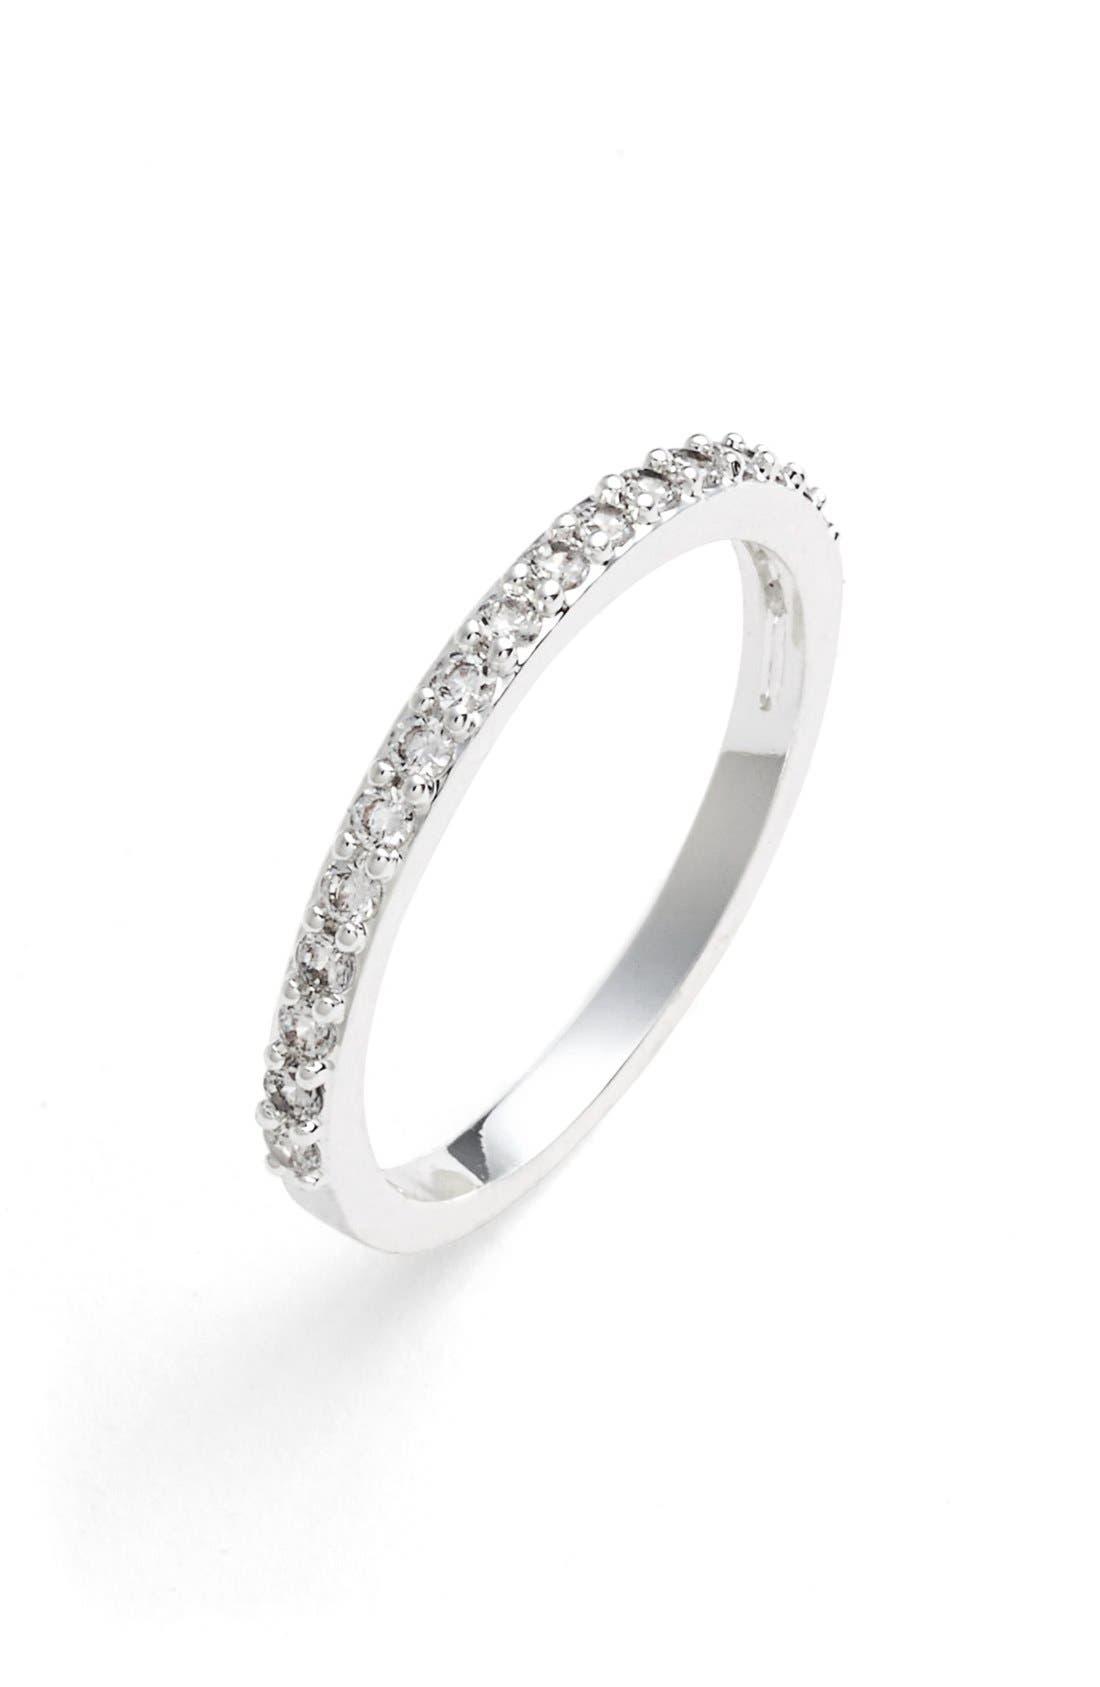 'Rings & Things' Band Ring,                             Main thumbnail 1, color,                             Silver/ Marcasite/ Crystal